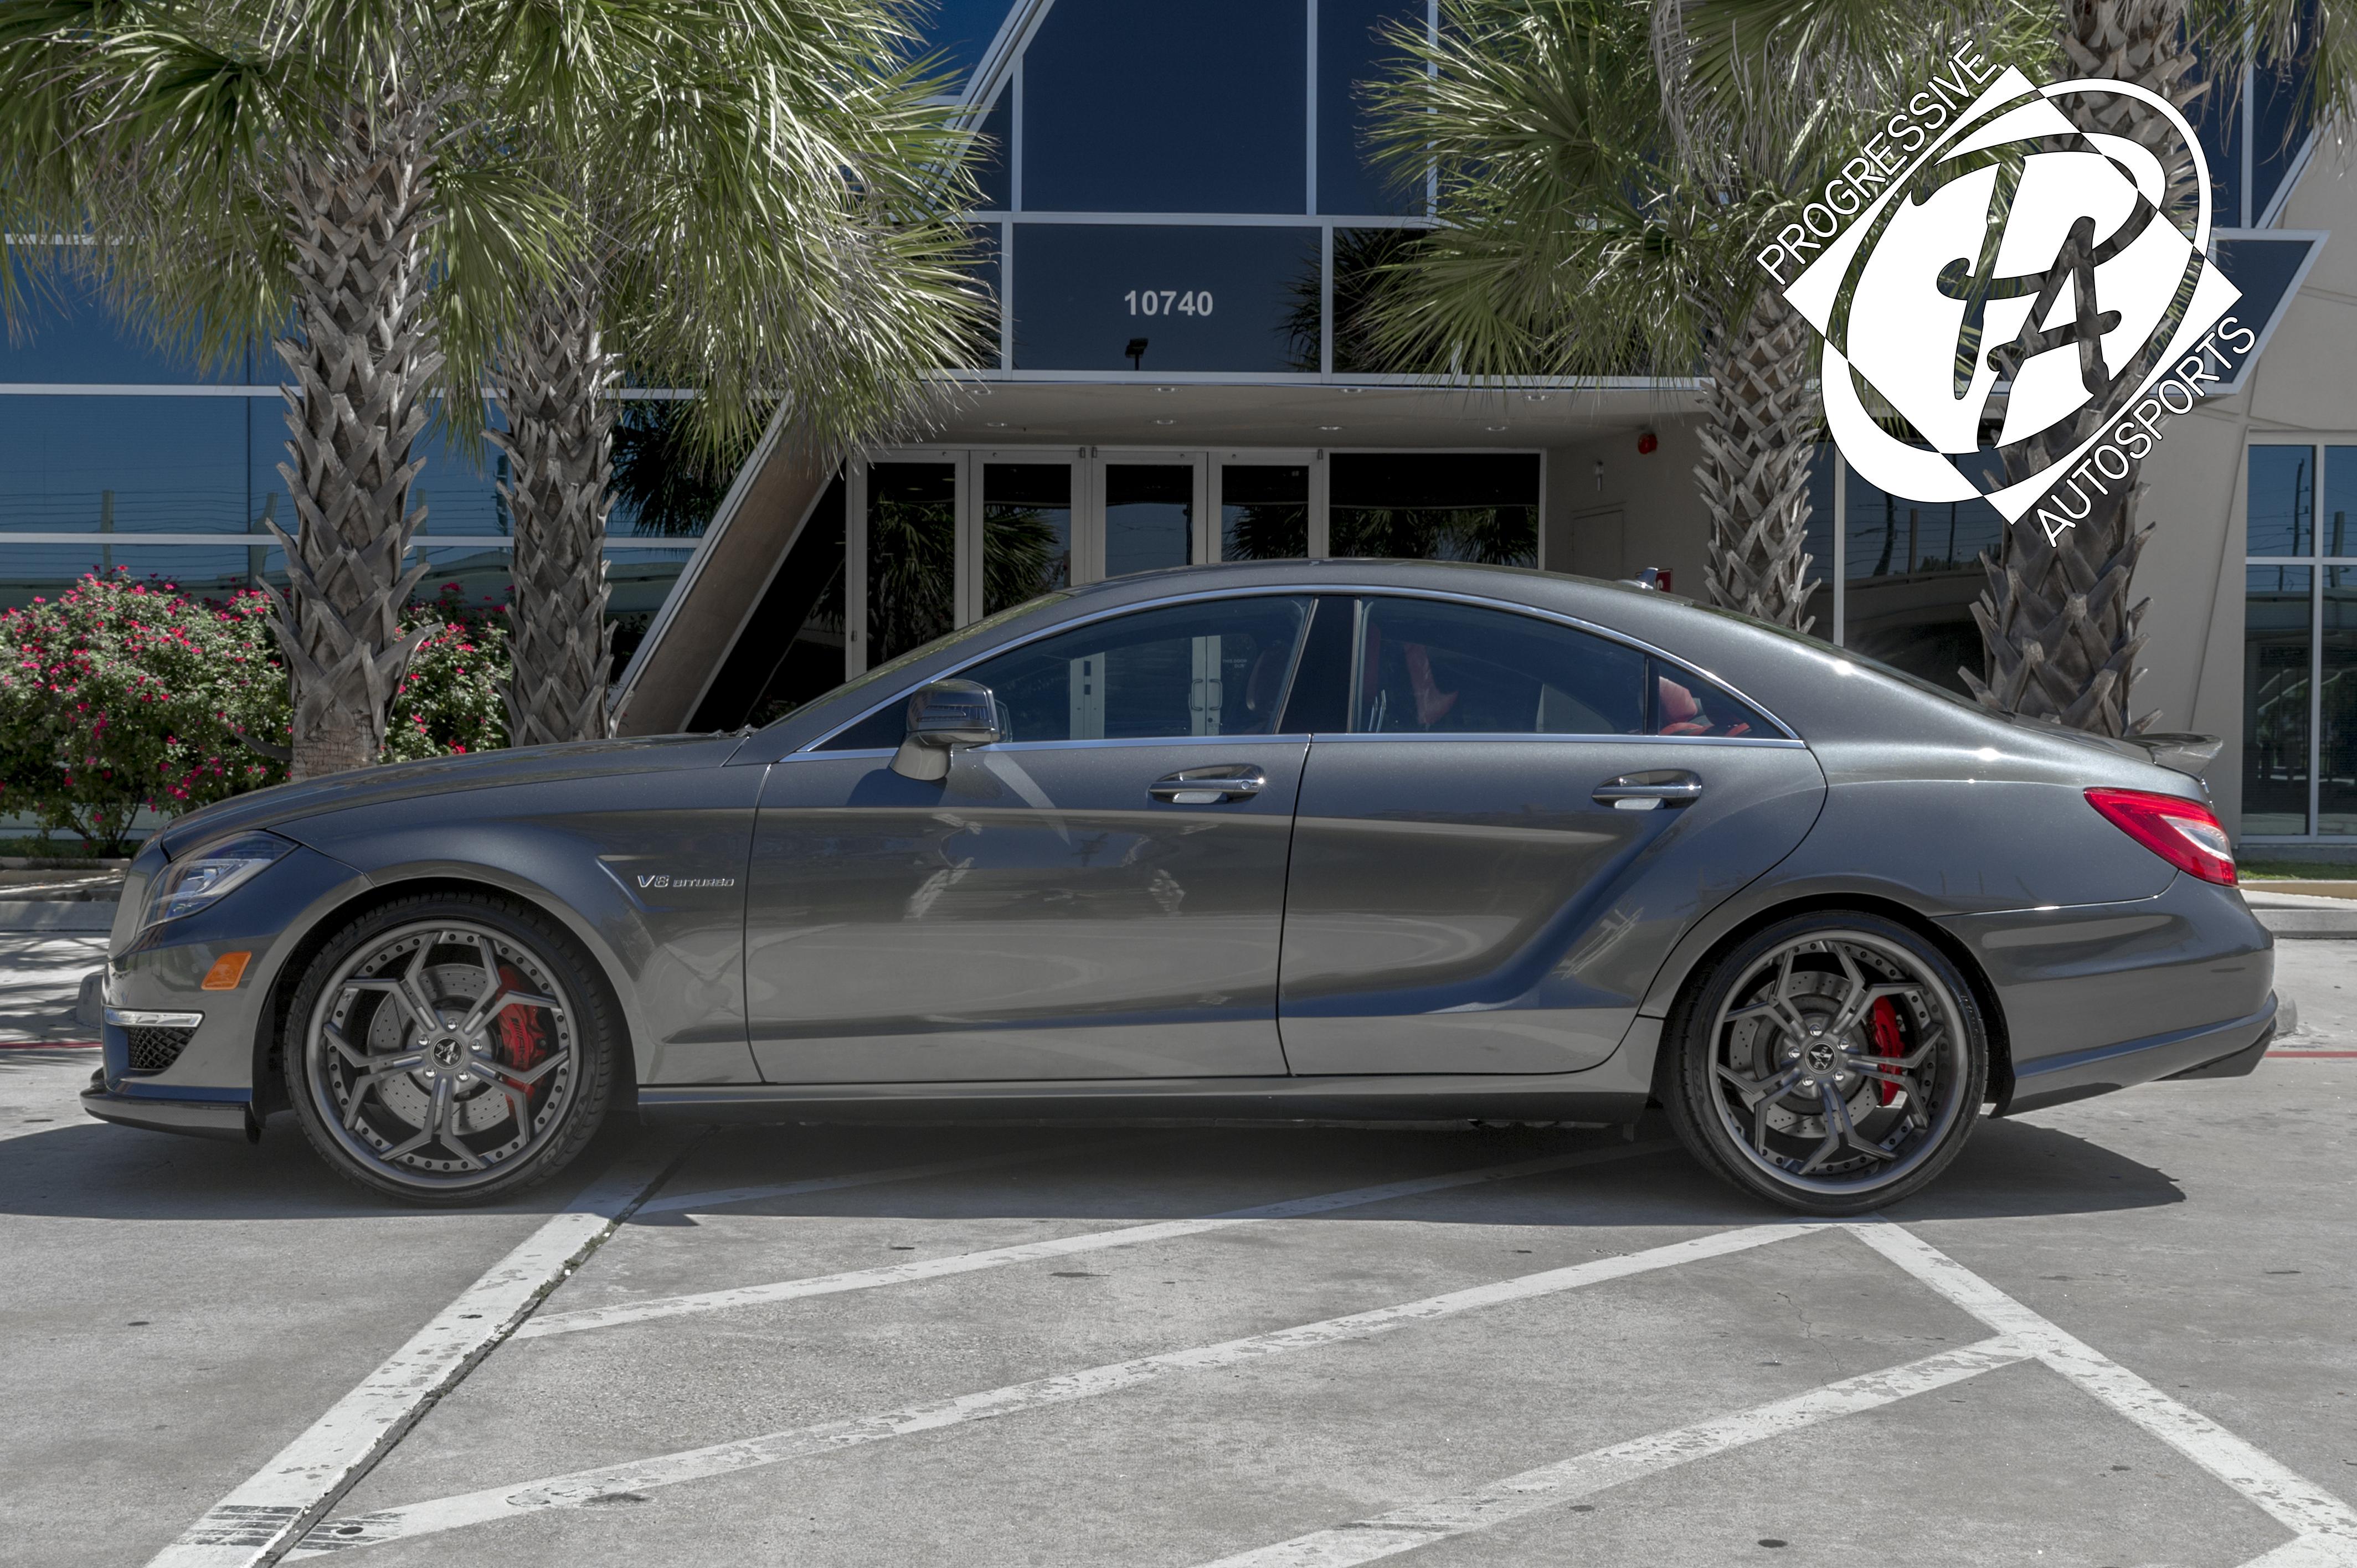 2012 MERCEDES AMG CLS63 - CUSTOM WIDE BODY PROJEKT - Progressive Autosports